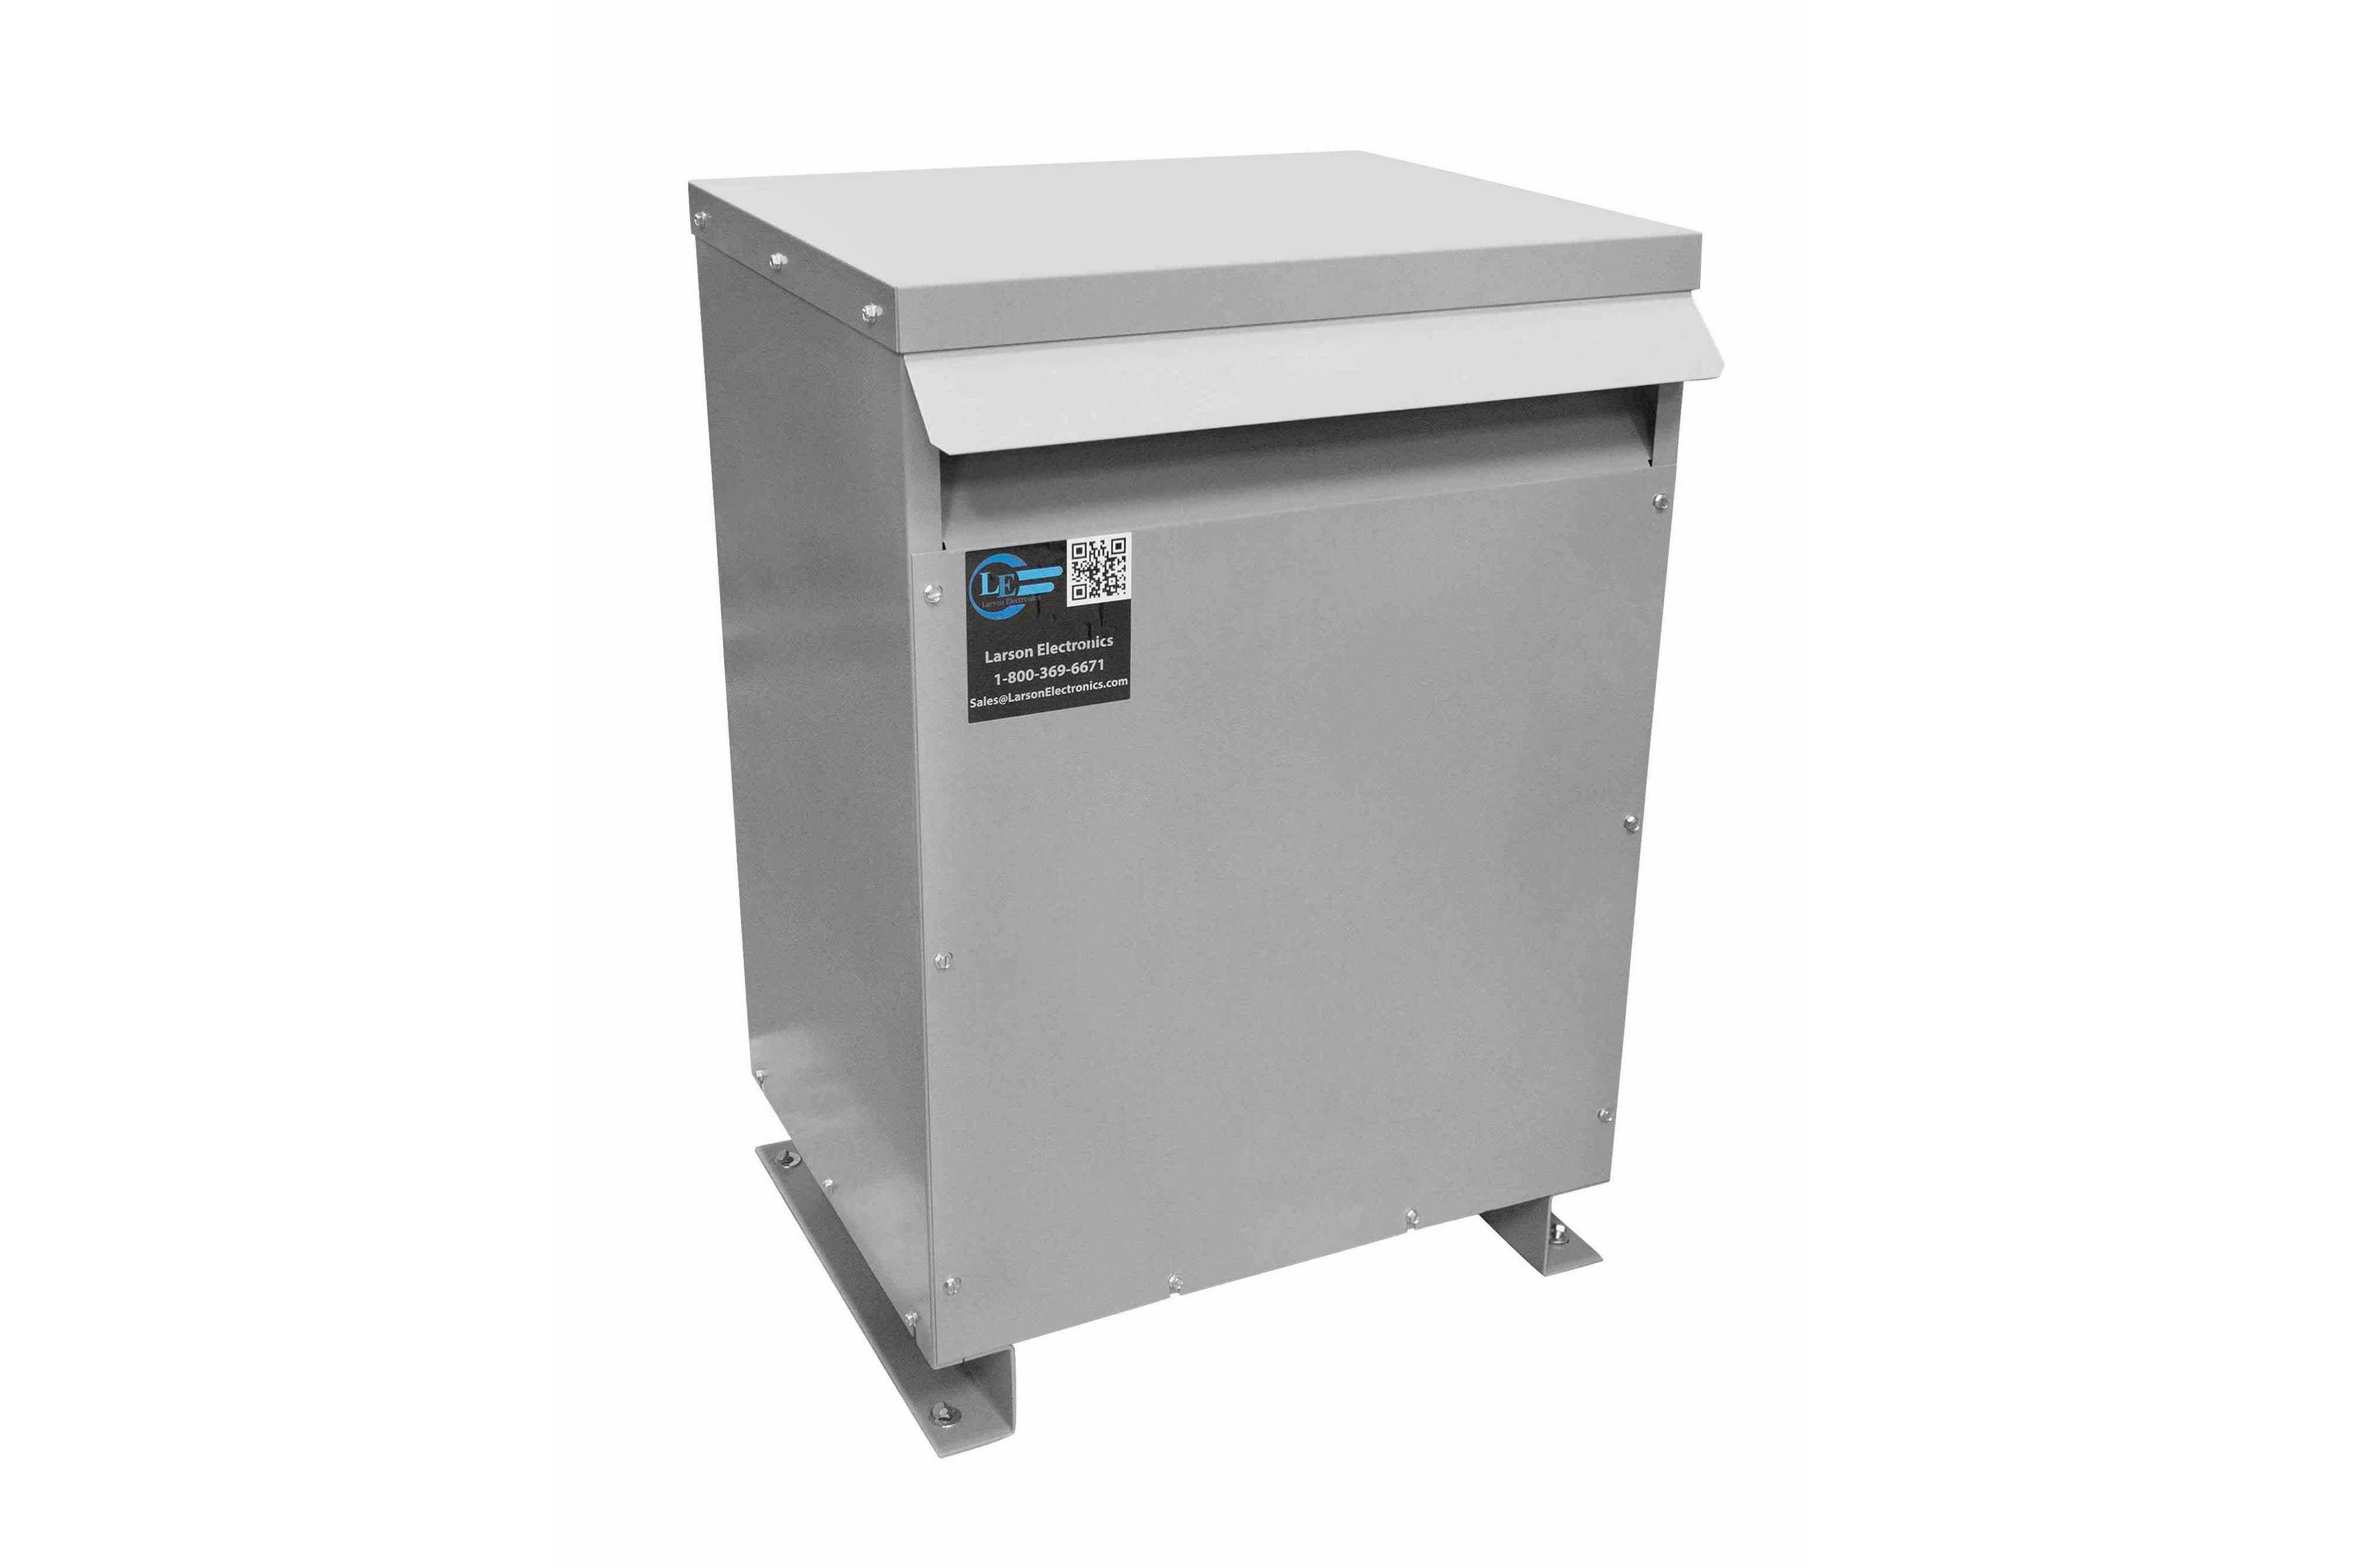 30 kVA 3PH Isolation Transformer, 480V Wye Primary, 480V Delta Secondary, N3R, Ventilated, 60 Hz